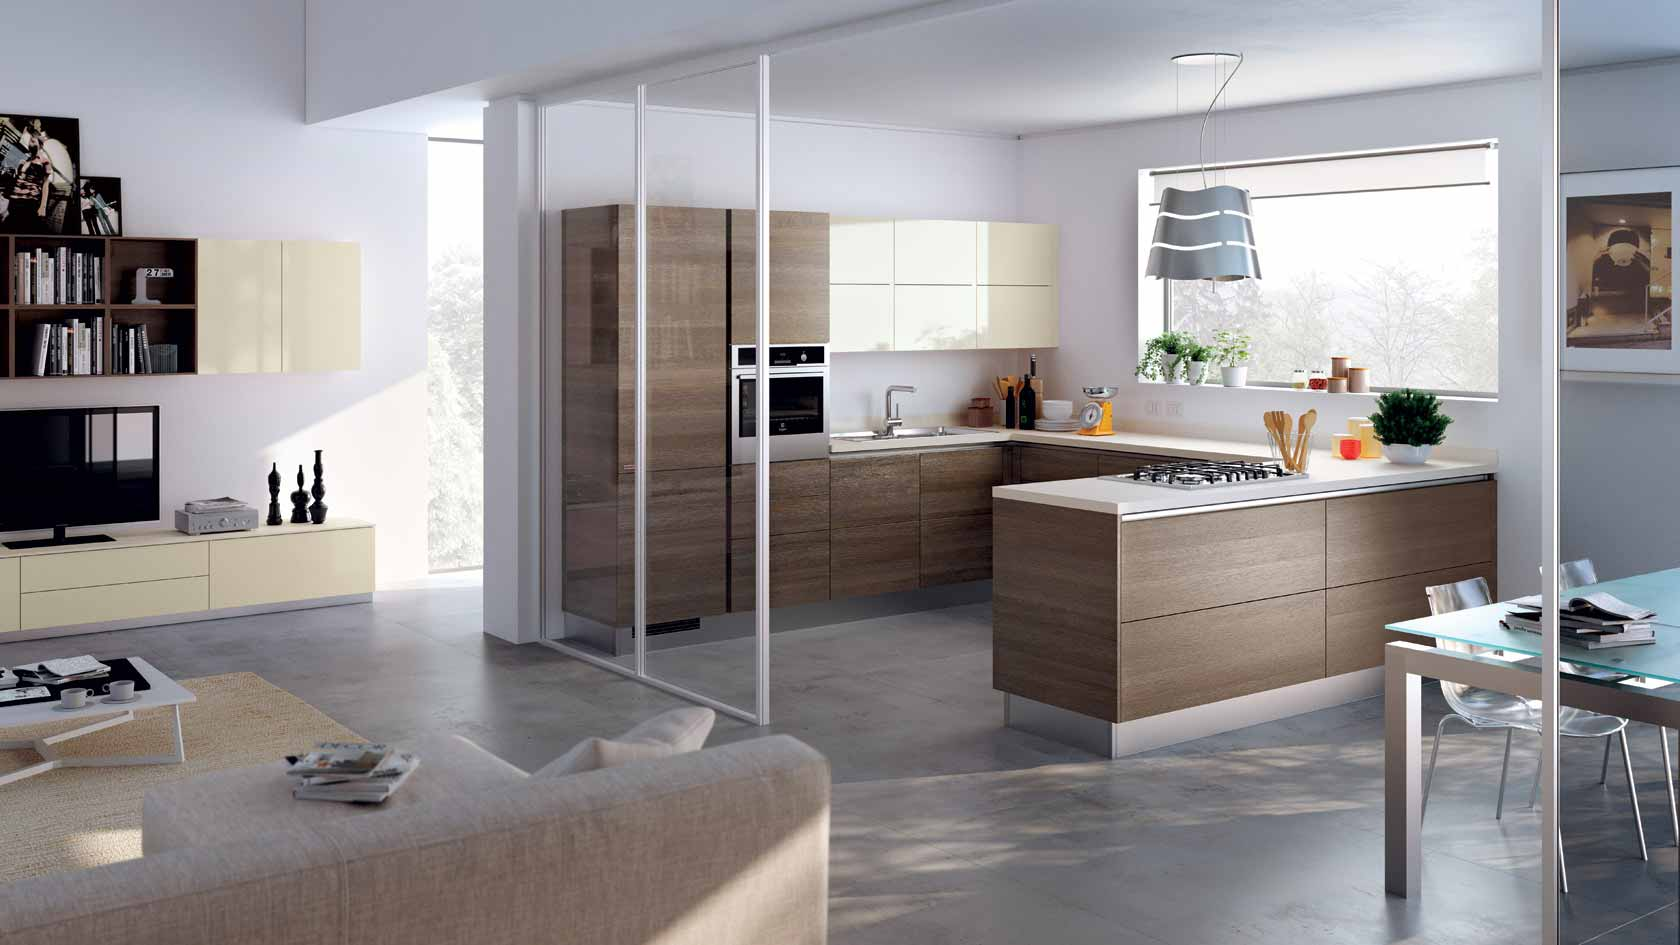 Residenza Cascina Gaita Cucina Scavolini 03